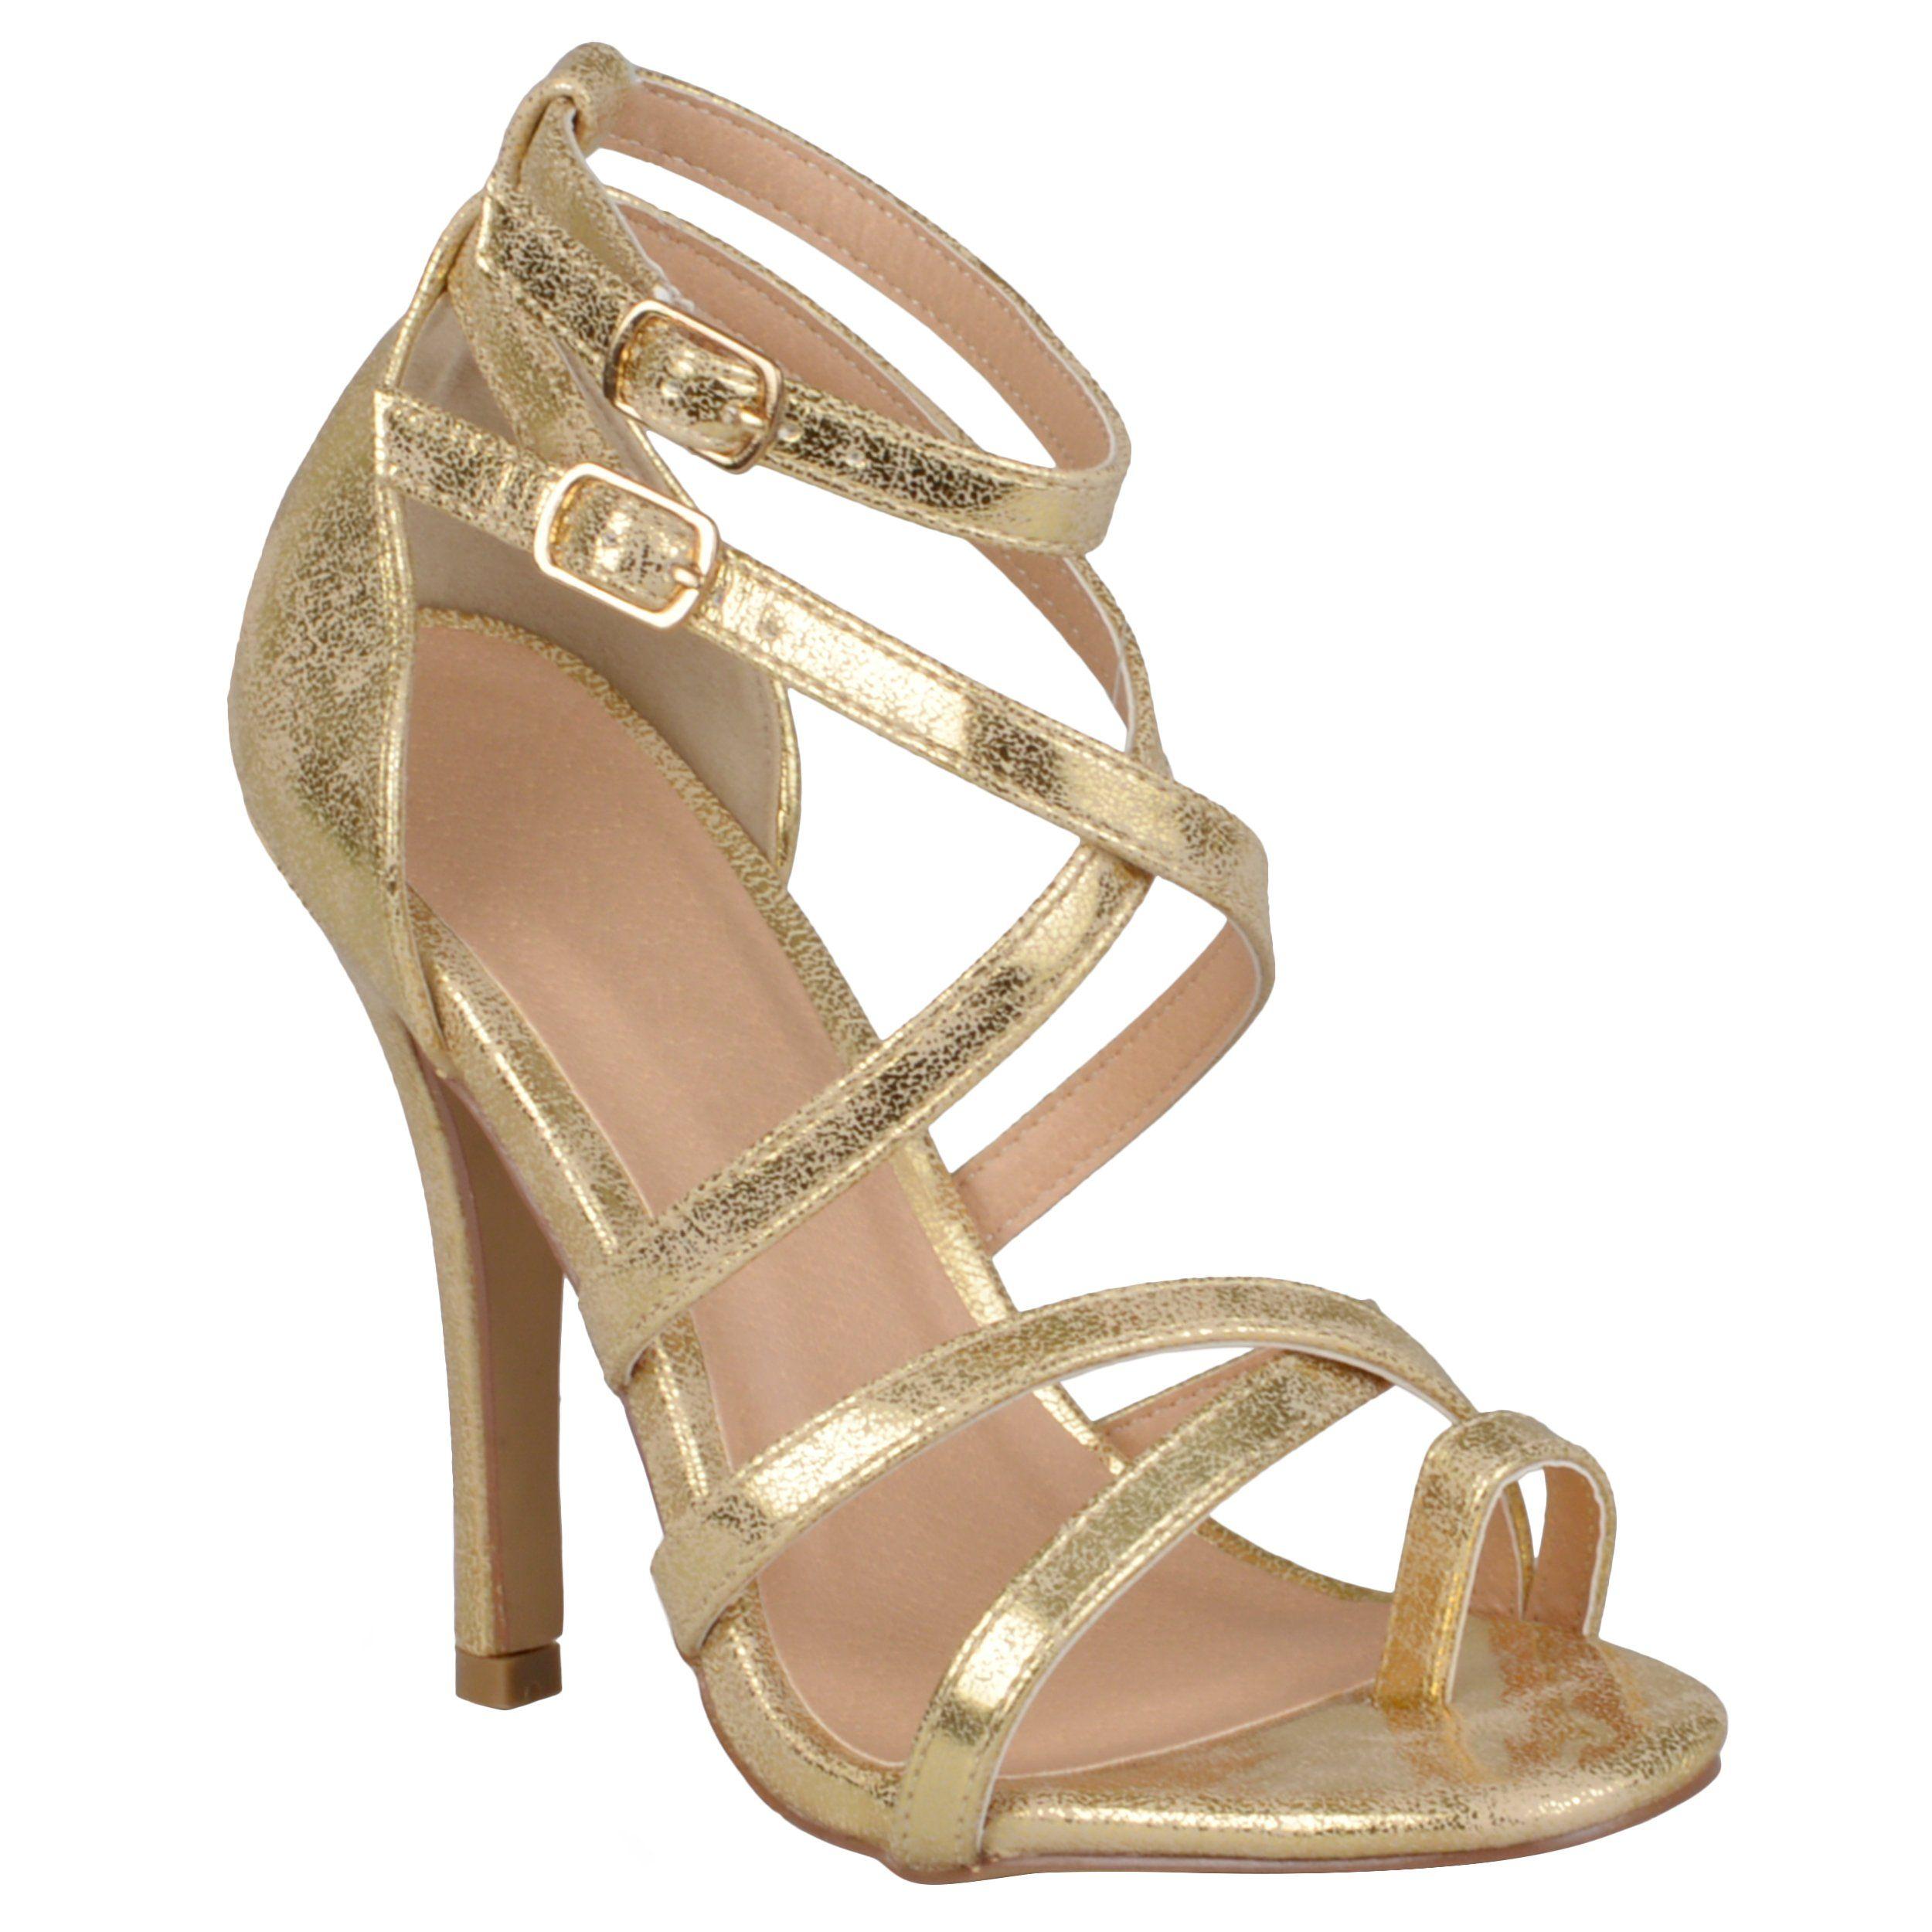 Brinley Co. Womens Strappy High Heel Sandals